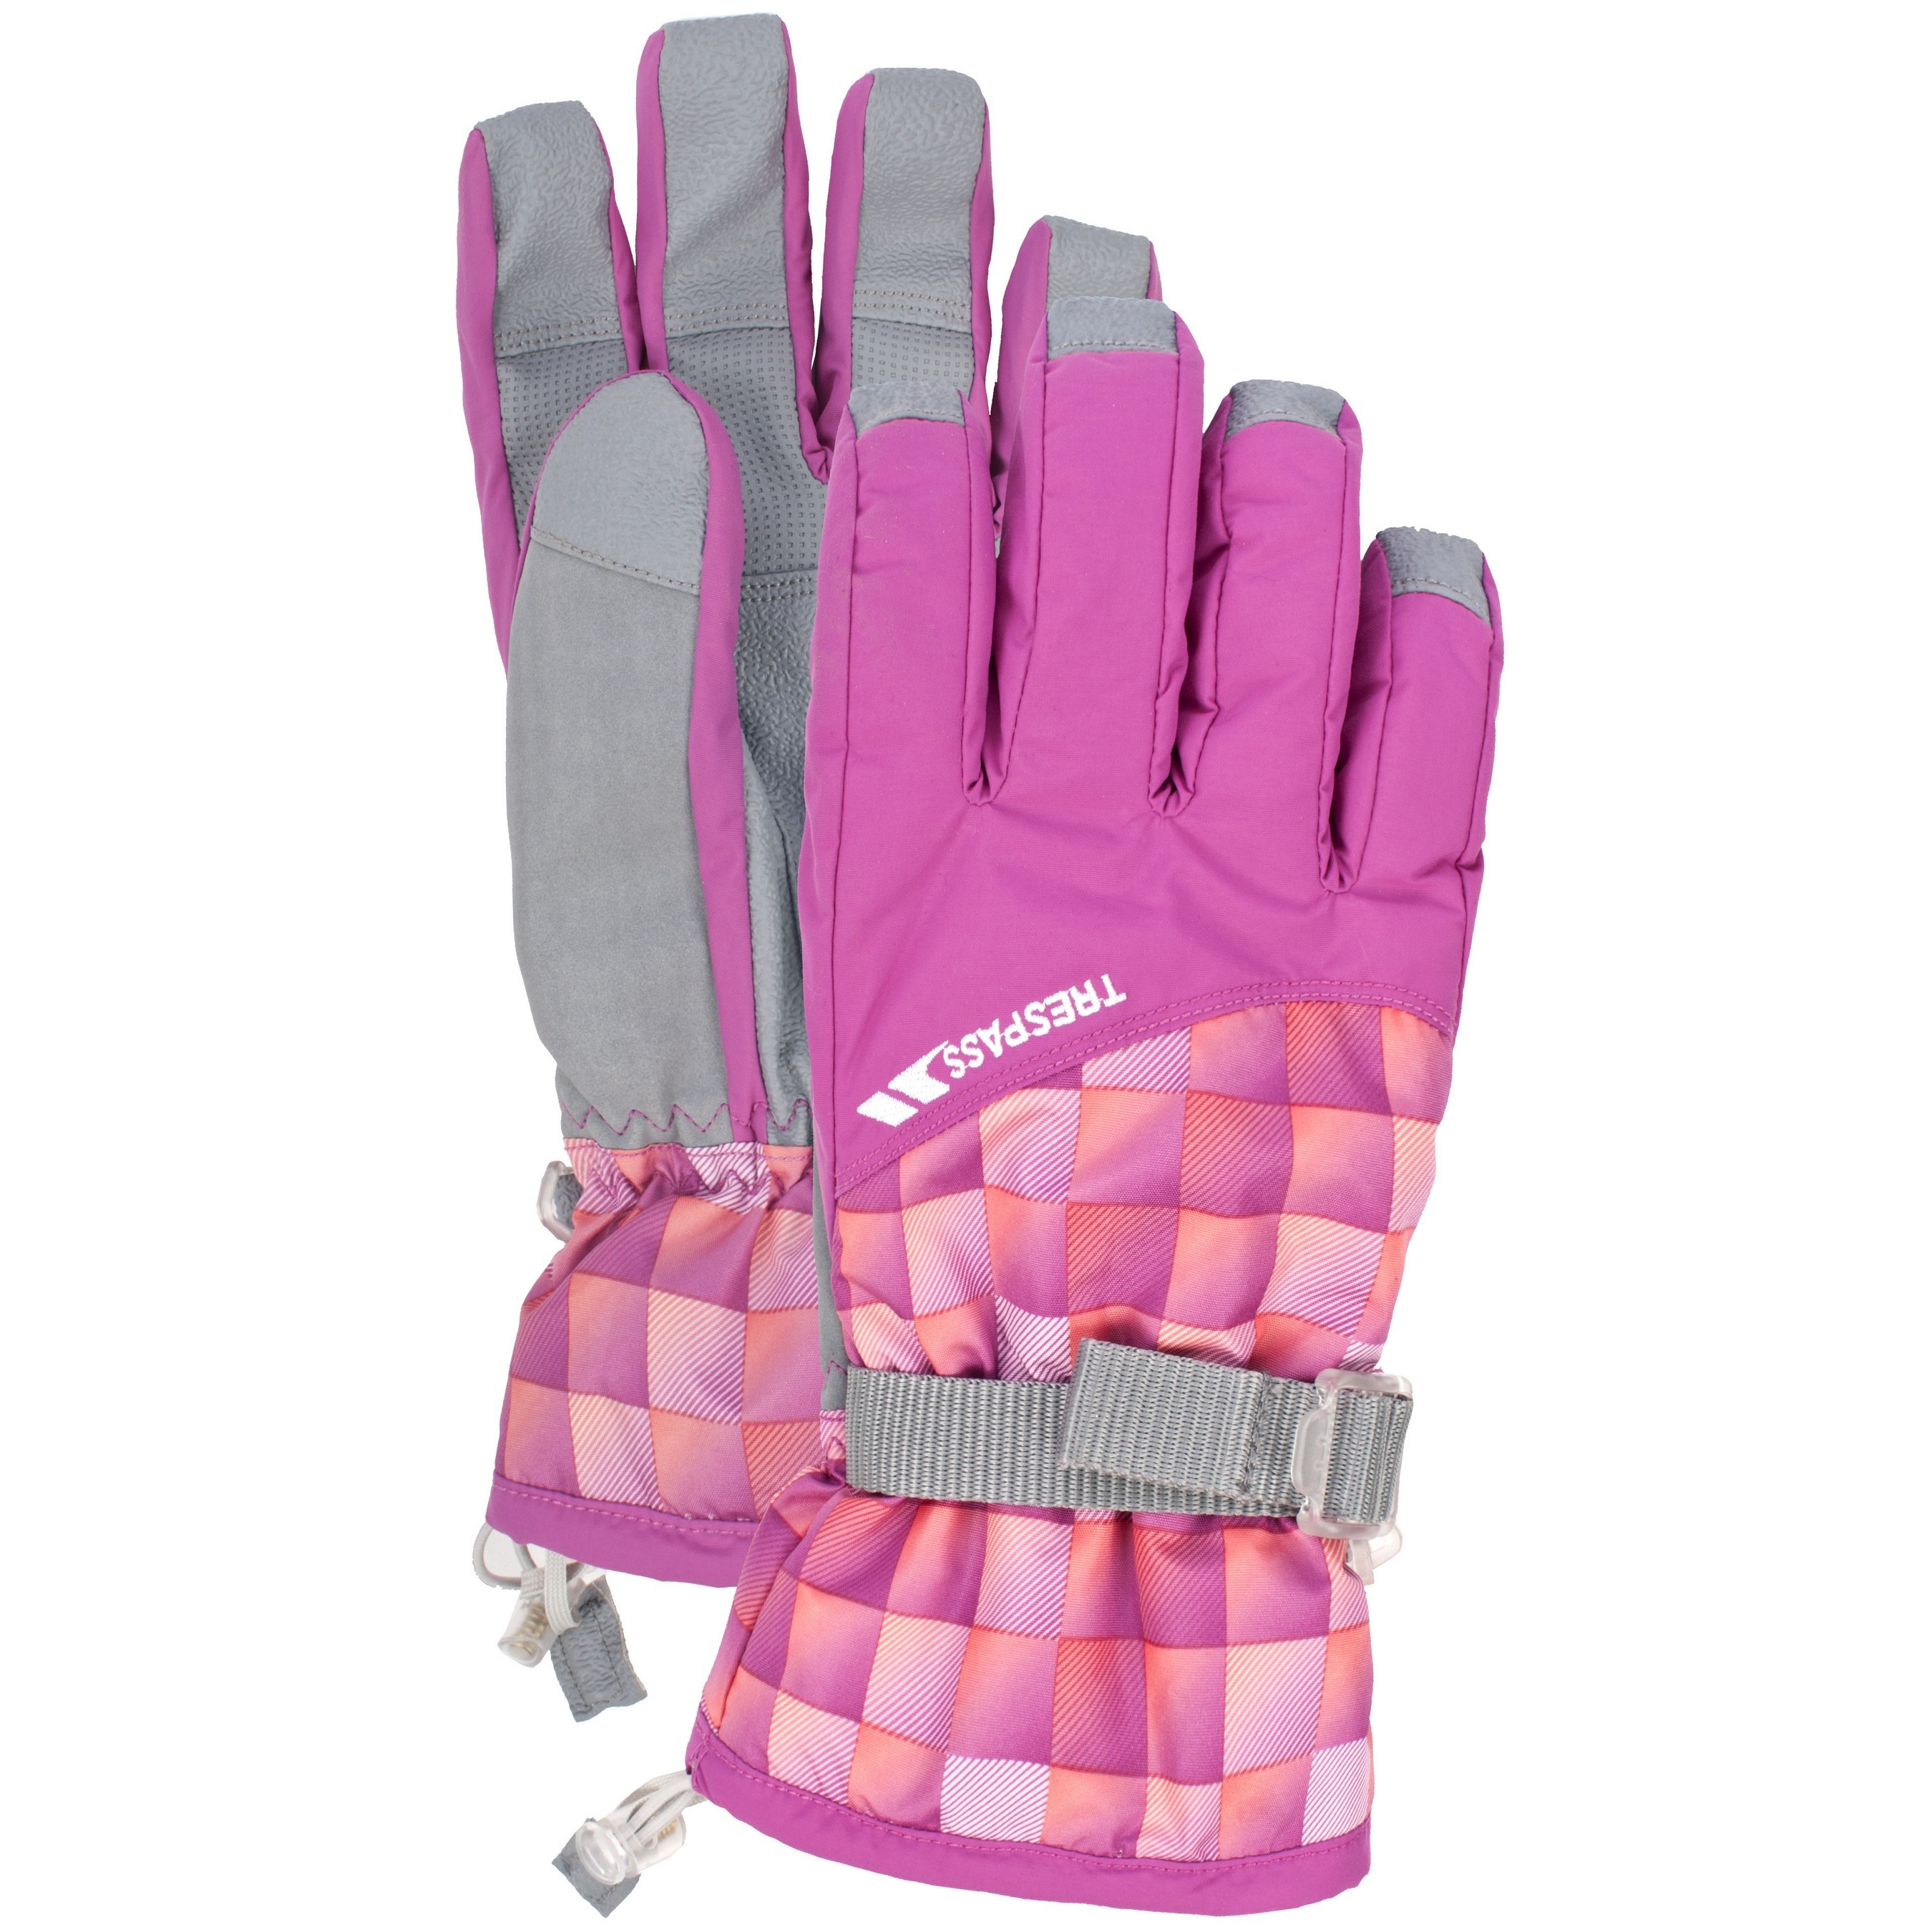 trespass damen etoile ski handschuhe wasserfest ebay. Black Bedroom Furniture Sets. Home Design Ideas